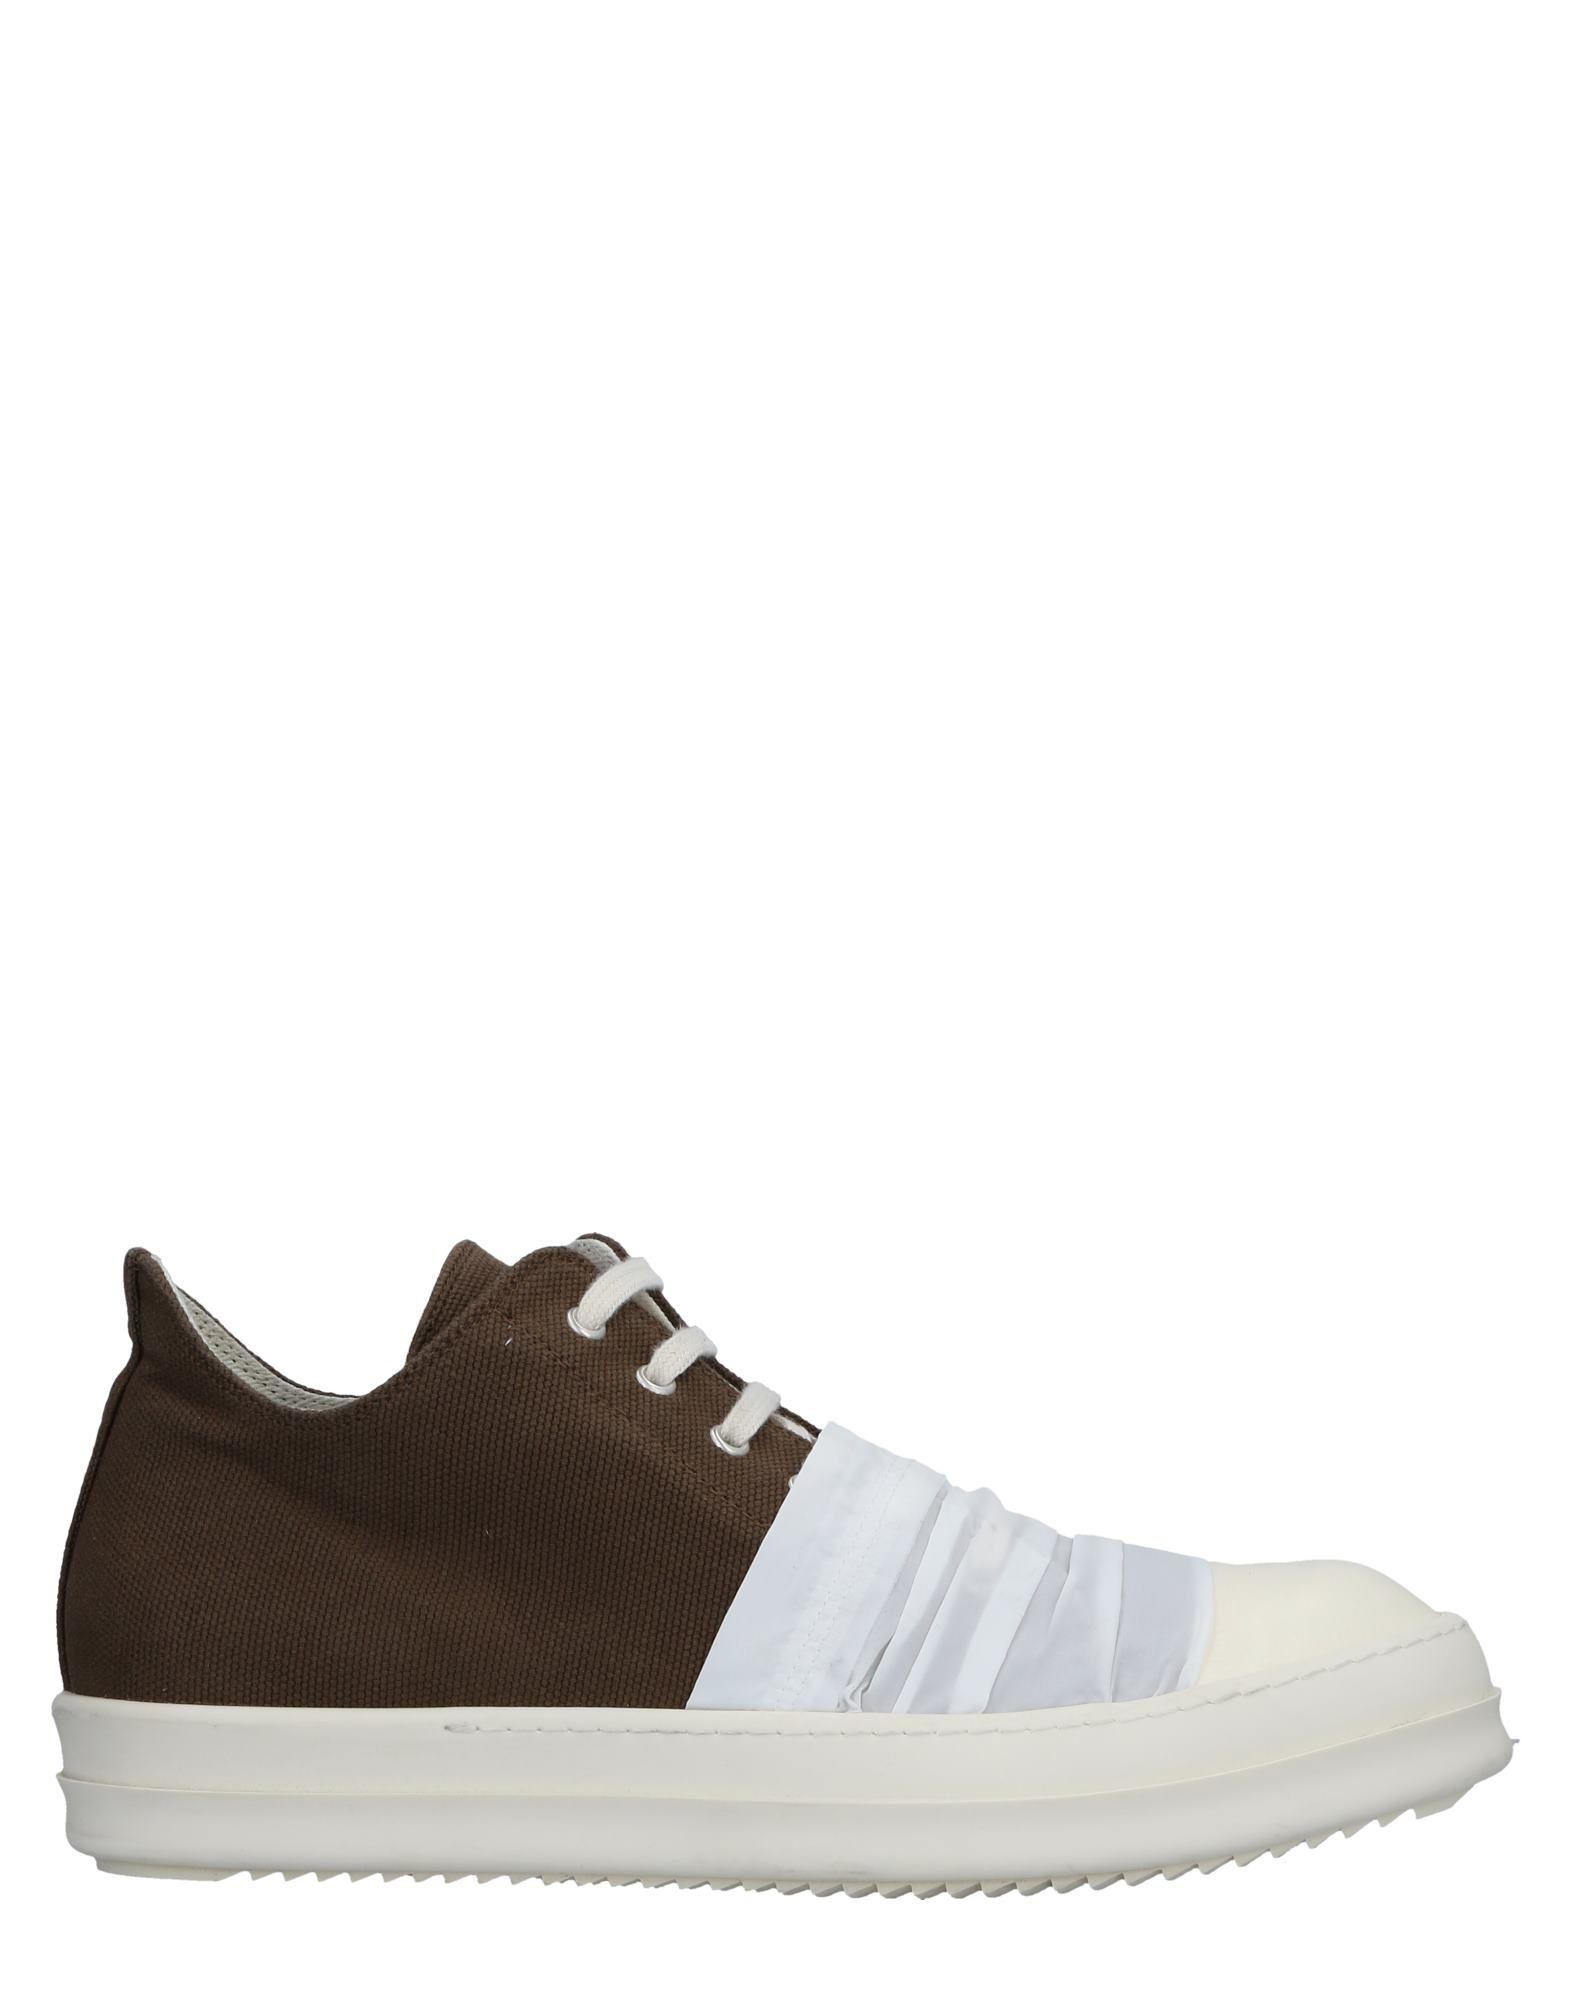 Drkshdw By Rick Owens Sneakers Herren   Herren 11517477GF Gute Qualität beliebte Schuhe 7ea3e1